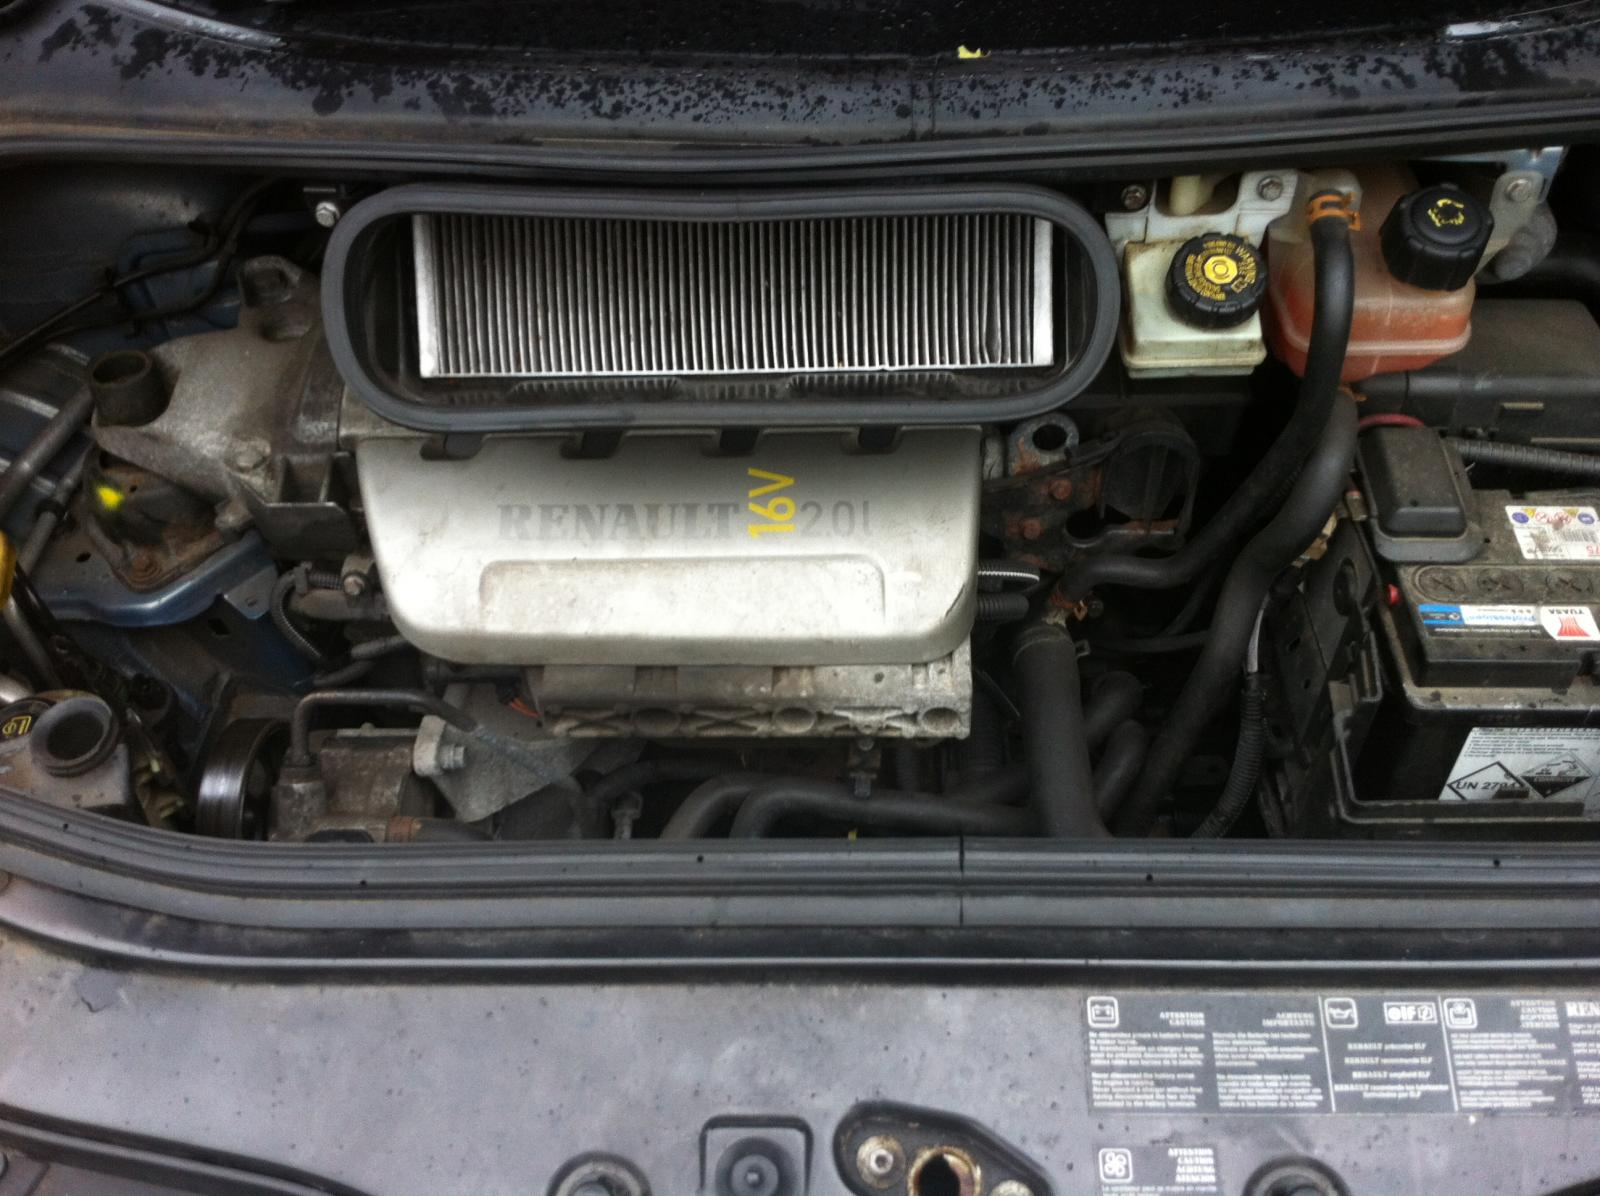 renault megane mk3 radio wiring diagram 2004 jeep grand cherokee limited espace iv library